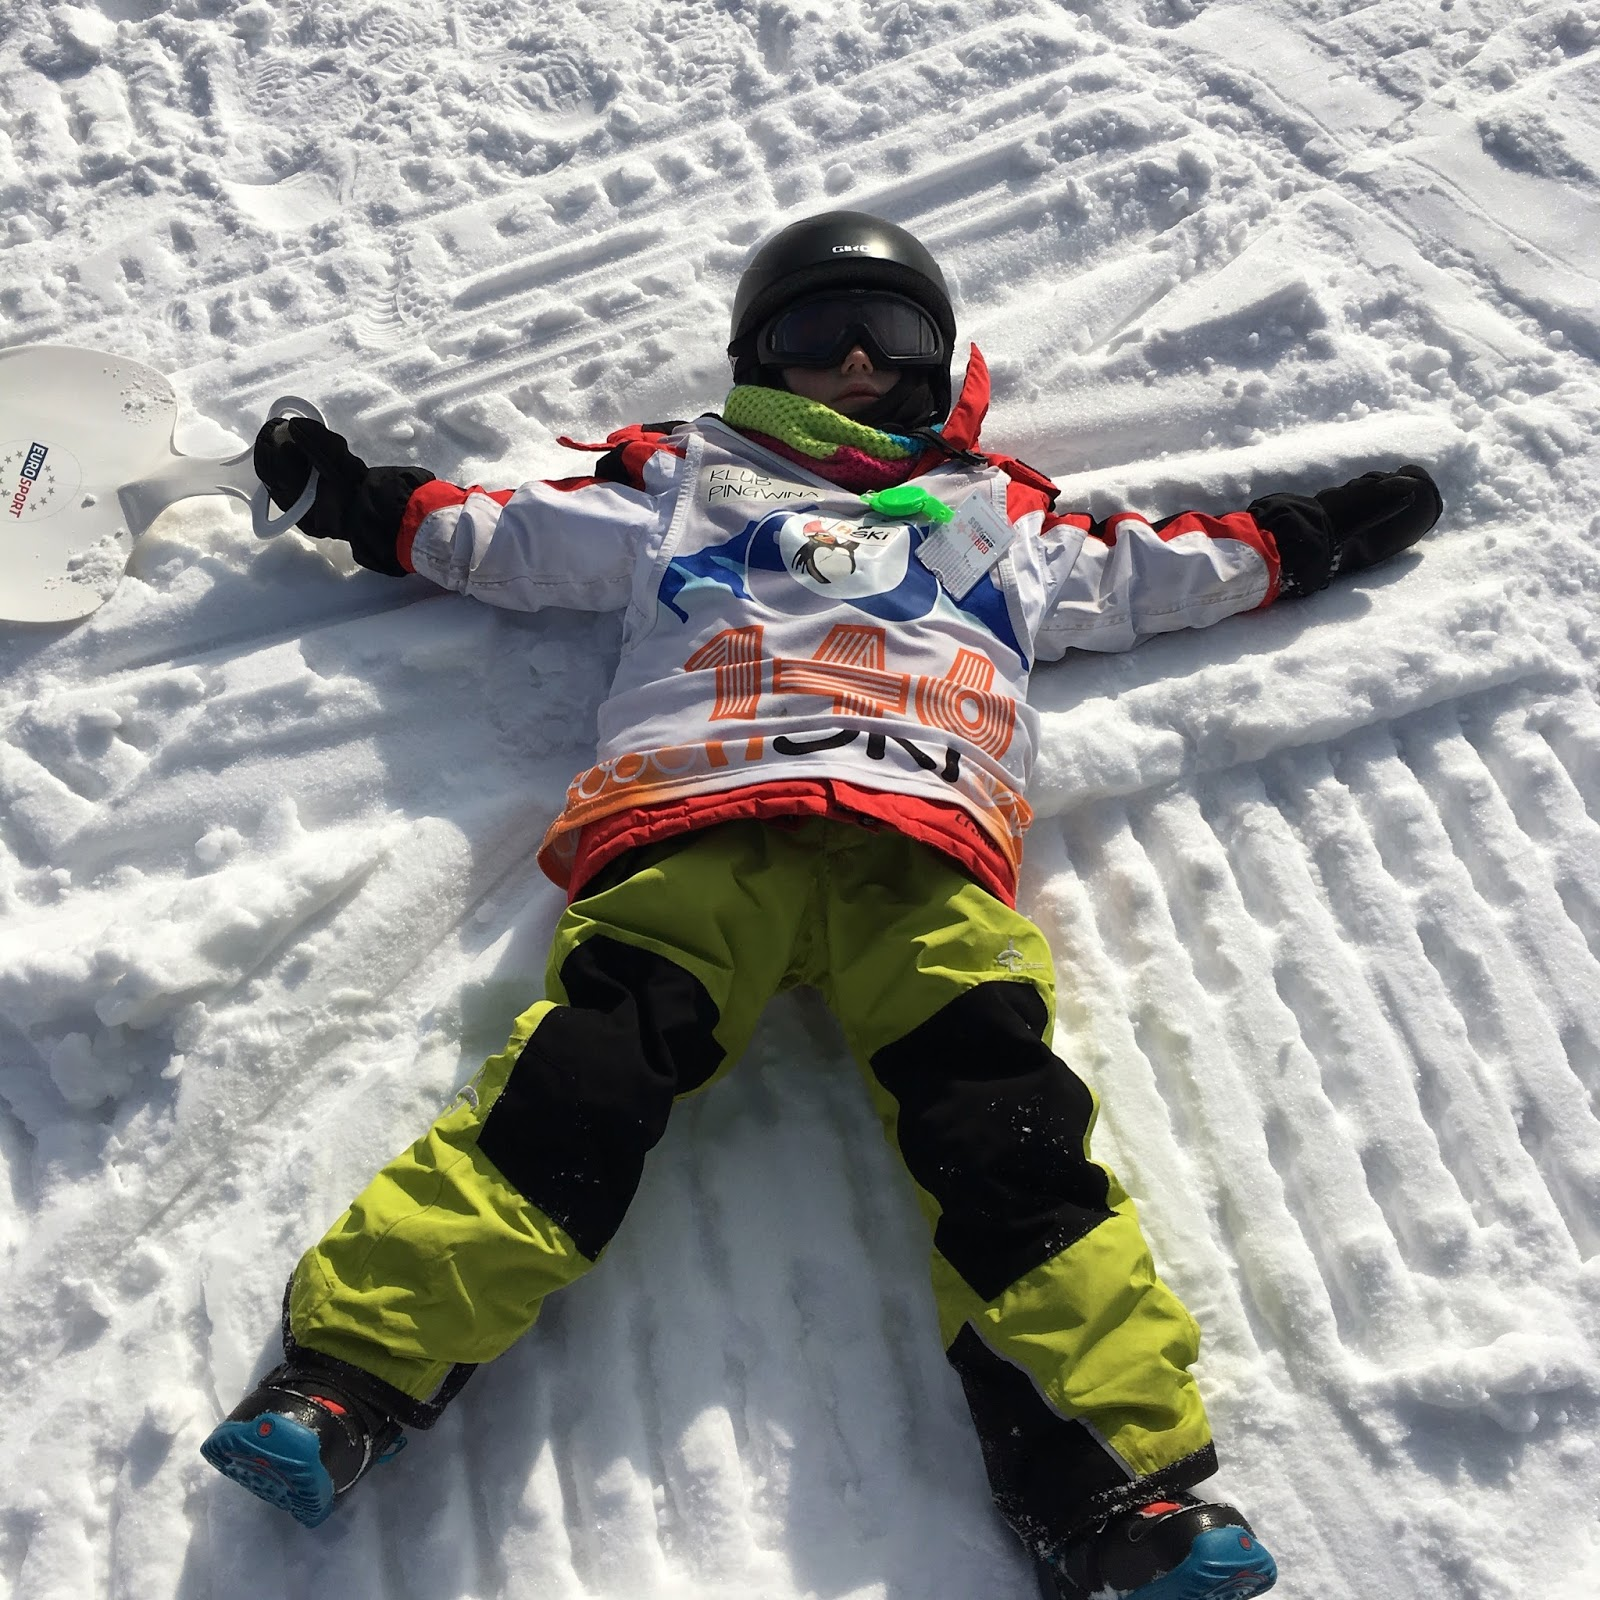 hski kursy narciarskie